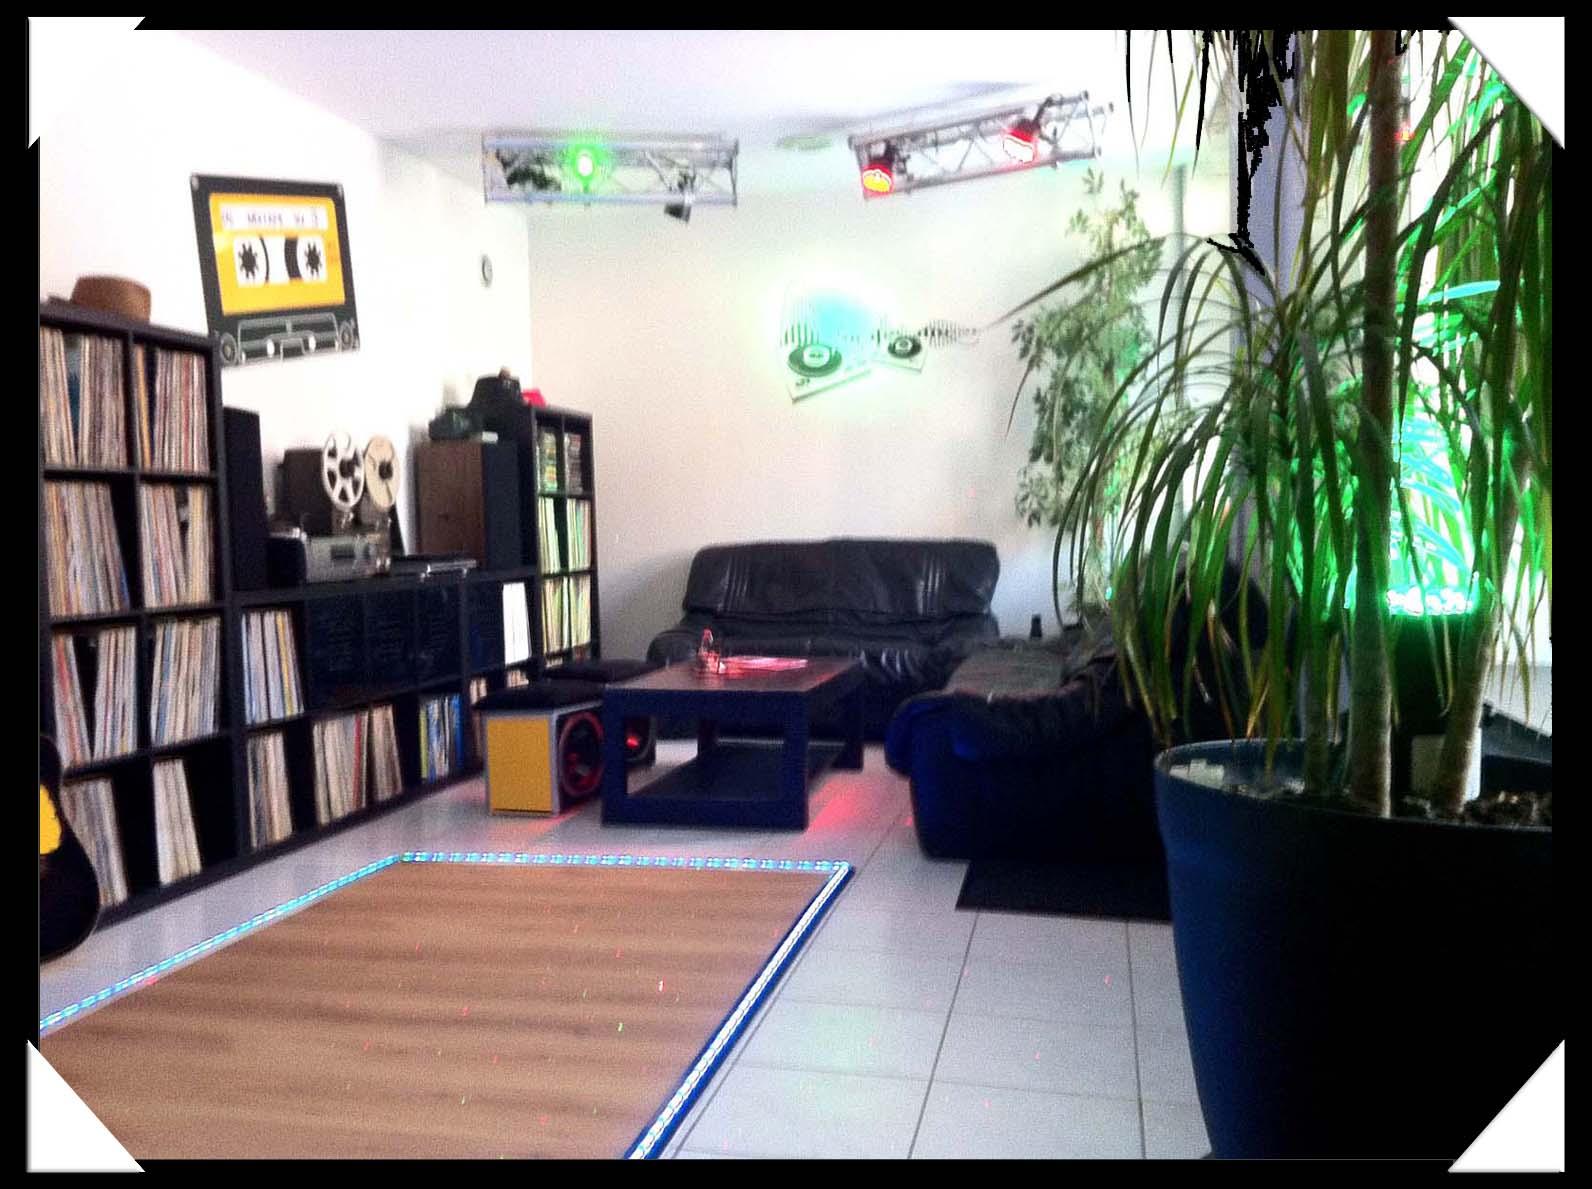 Show room espace détente Djeepyprod